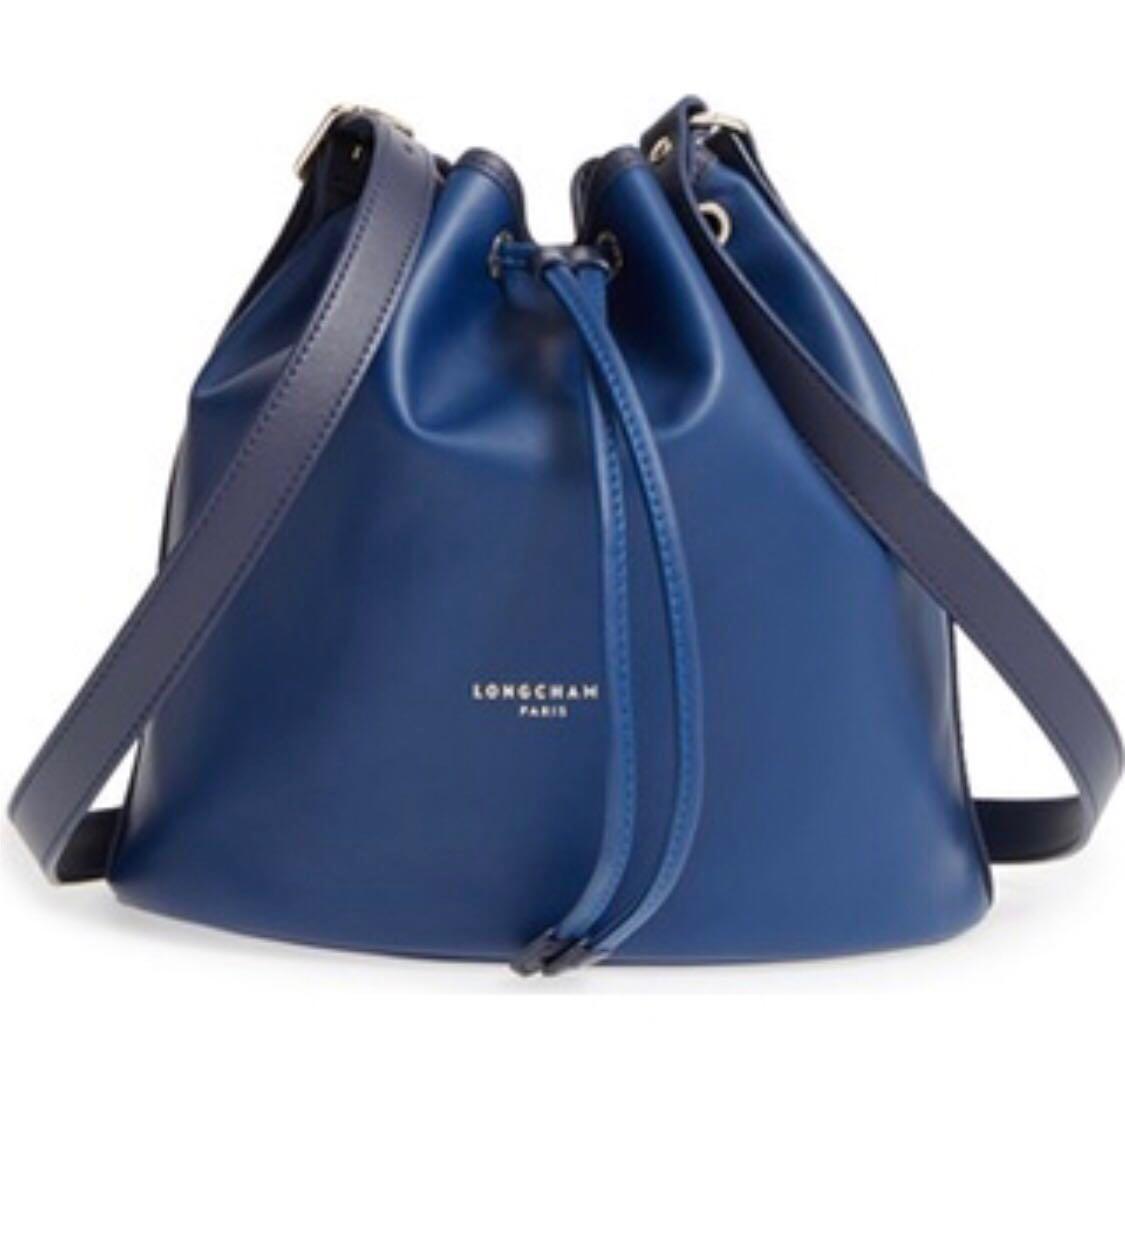 ef4a52df17f72 Longchamp Leather Bucket bag